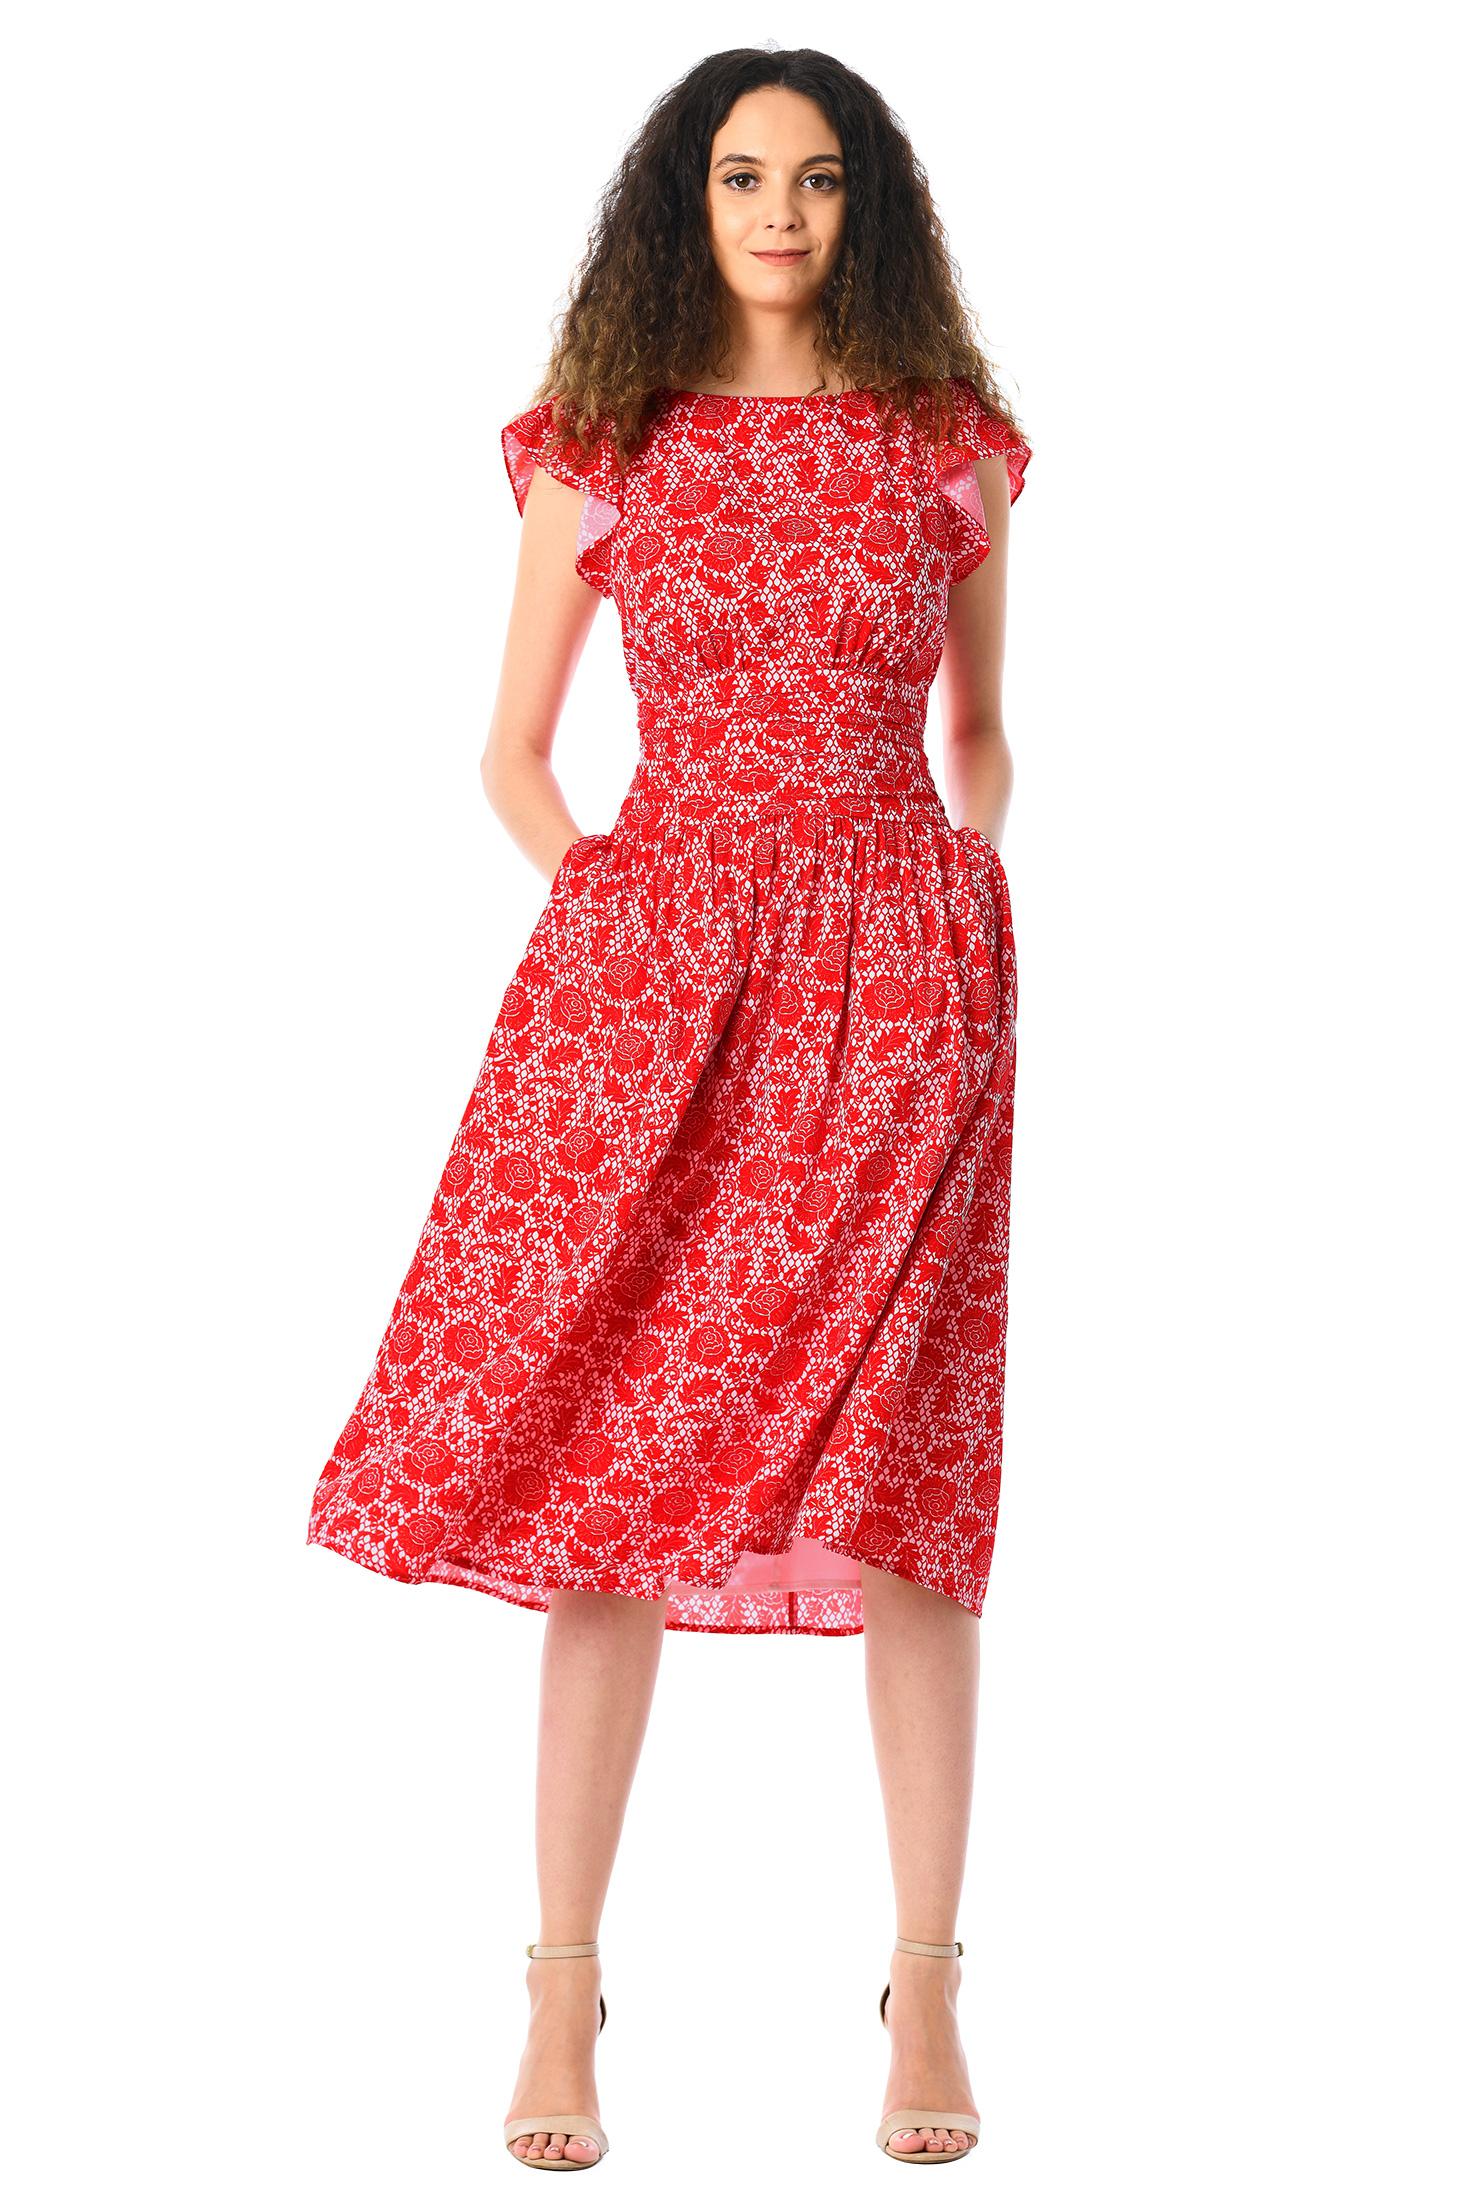 5524bc0d7 Women s Fashion Clothing 0-36W and Custom